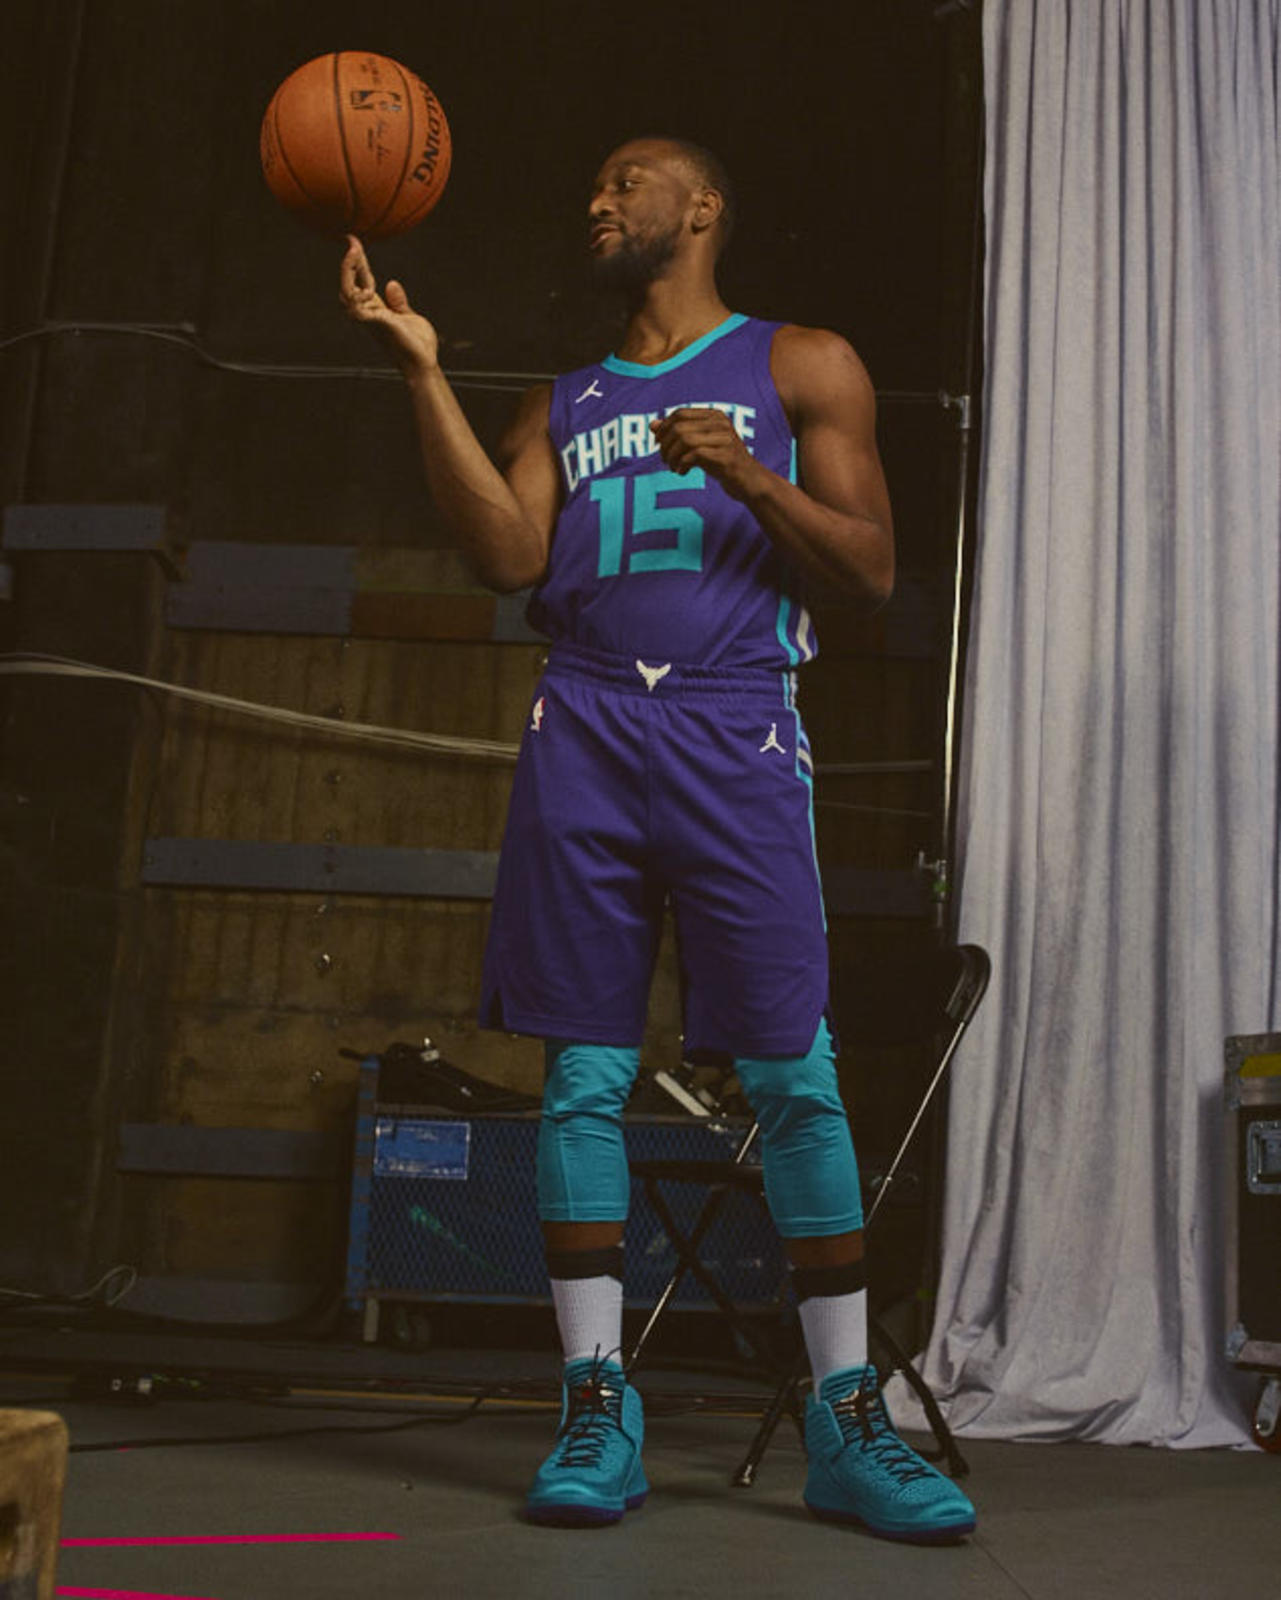 Nike NBA Statement Edition uniform